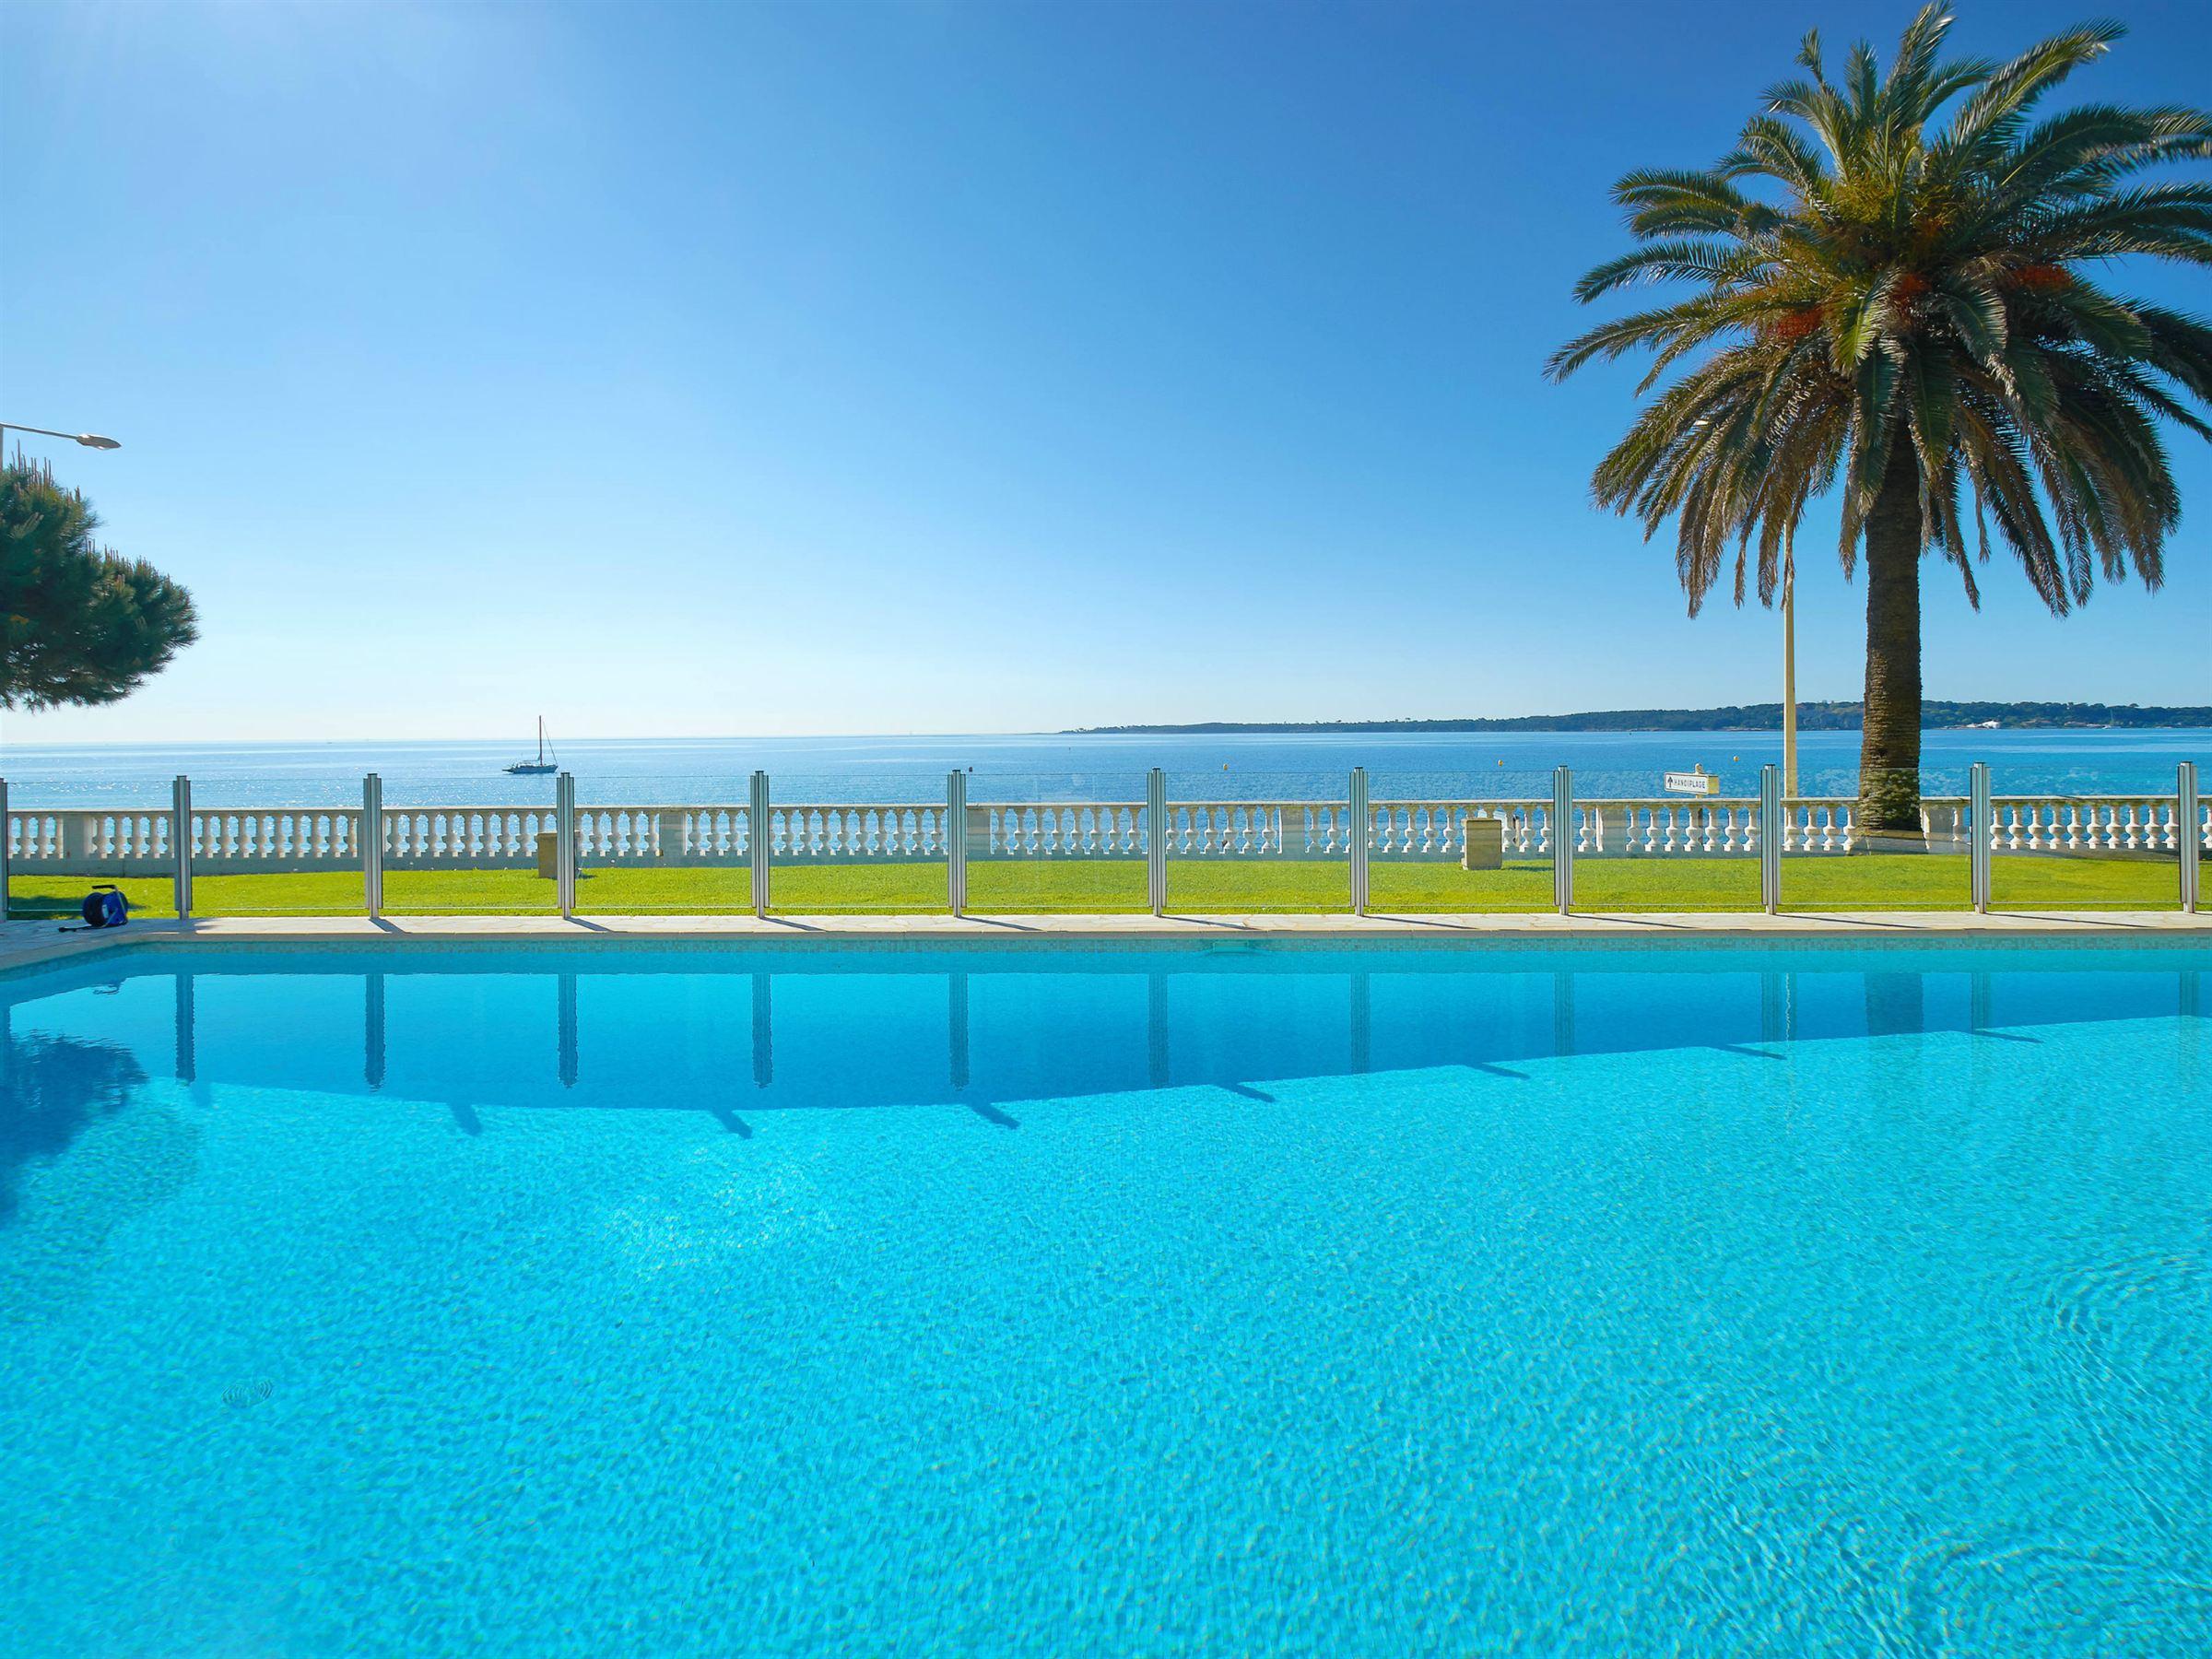 Apartamento para Venda às Cannes, luxurious garden floor apartment in seaside building with swimming pool Cannes, Provença-Alpes-Costa Azul 06400 França